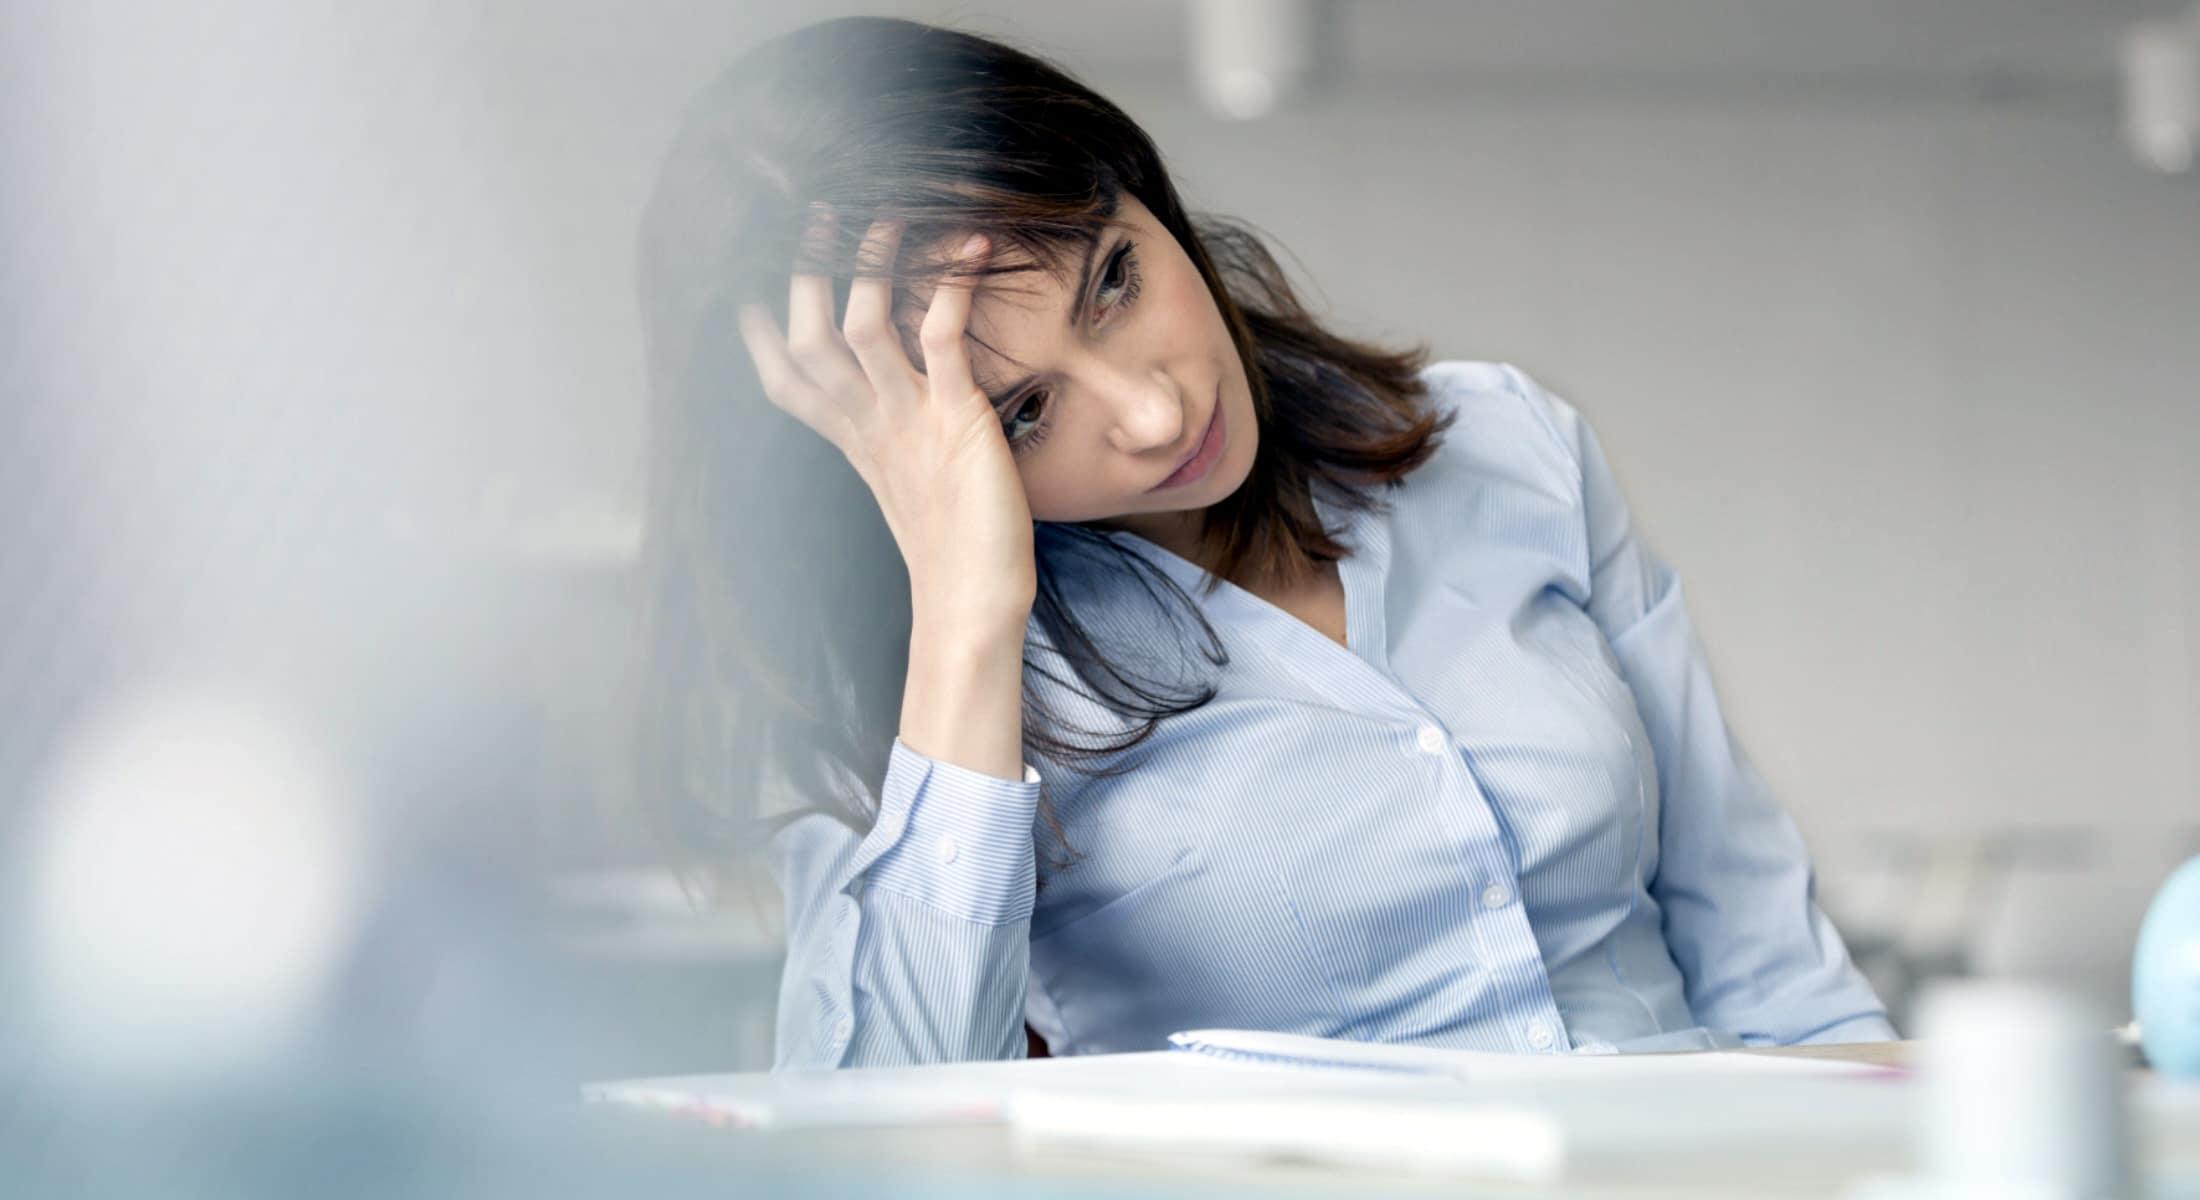 ea2882d39fb Διαβήτης: Η πρόωρη εμμηνόπαυση αυξάνει τον κίνδυνο | Healthpharma.gr